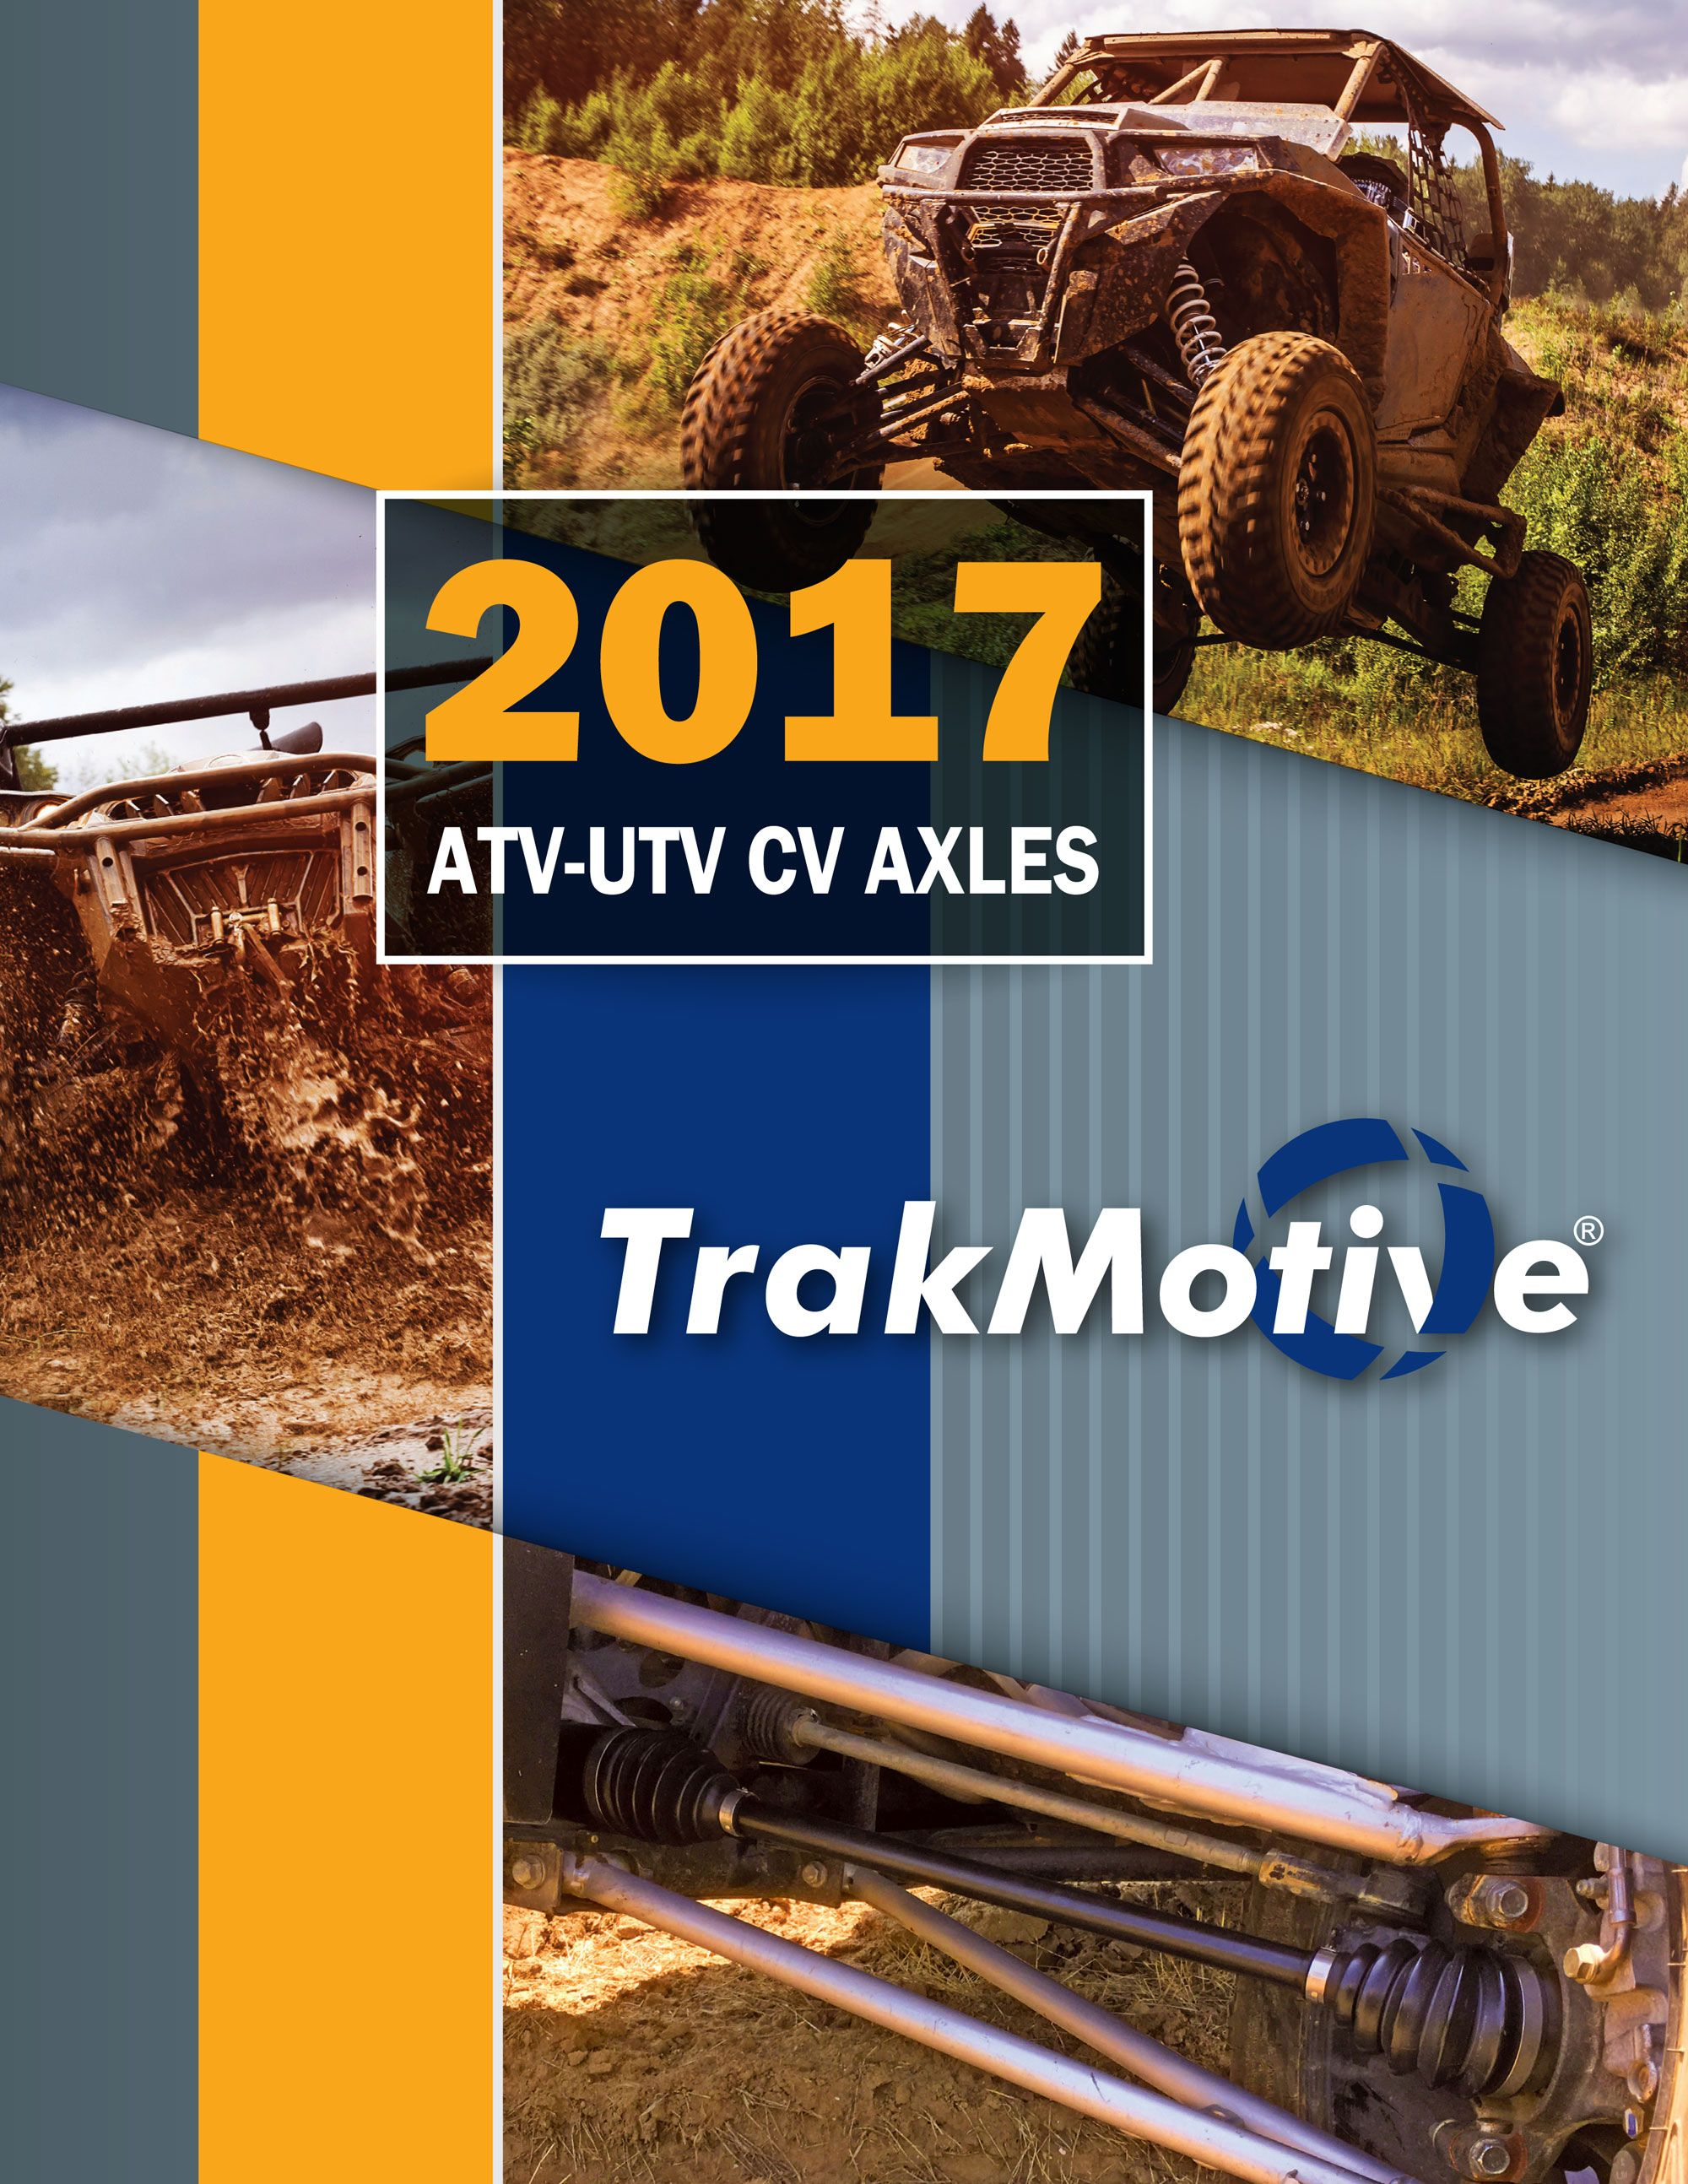 TrakMotive Releases 2017 ATVUTV CV Axle Catalog with